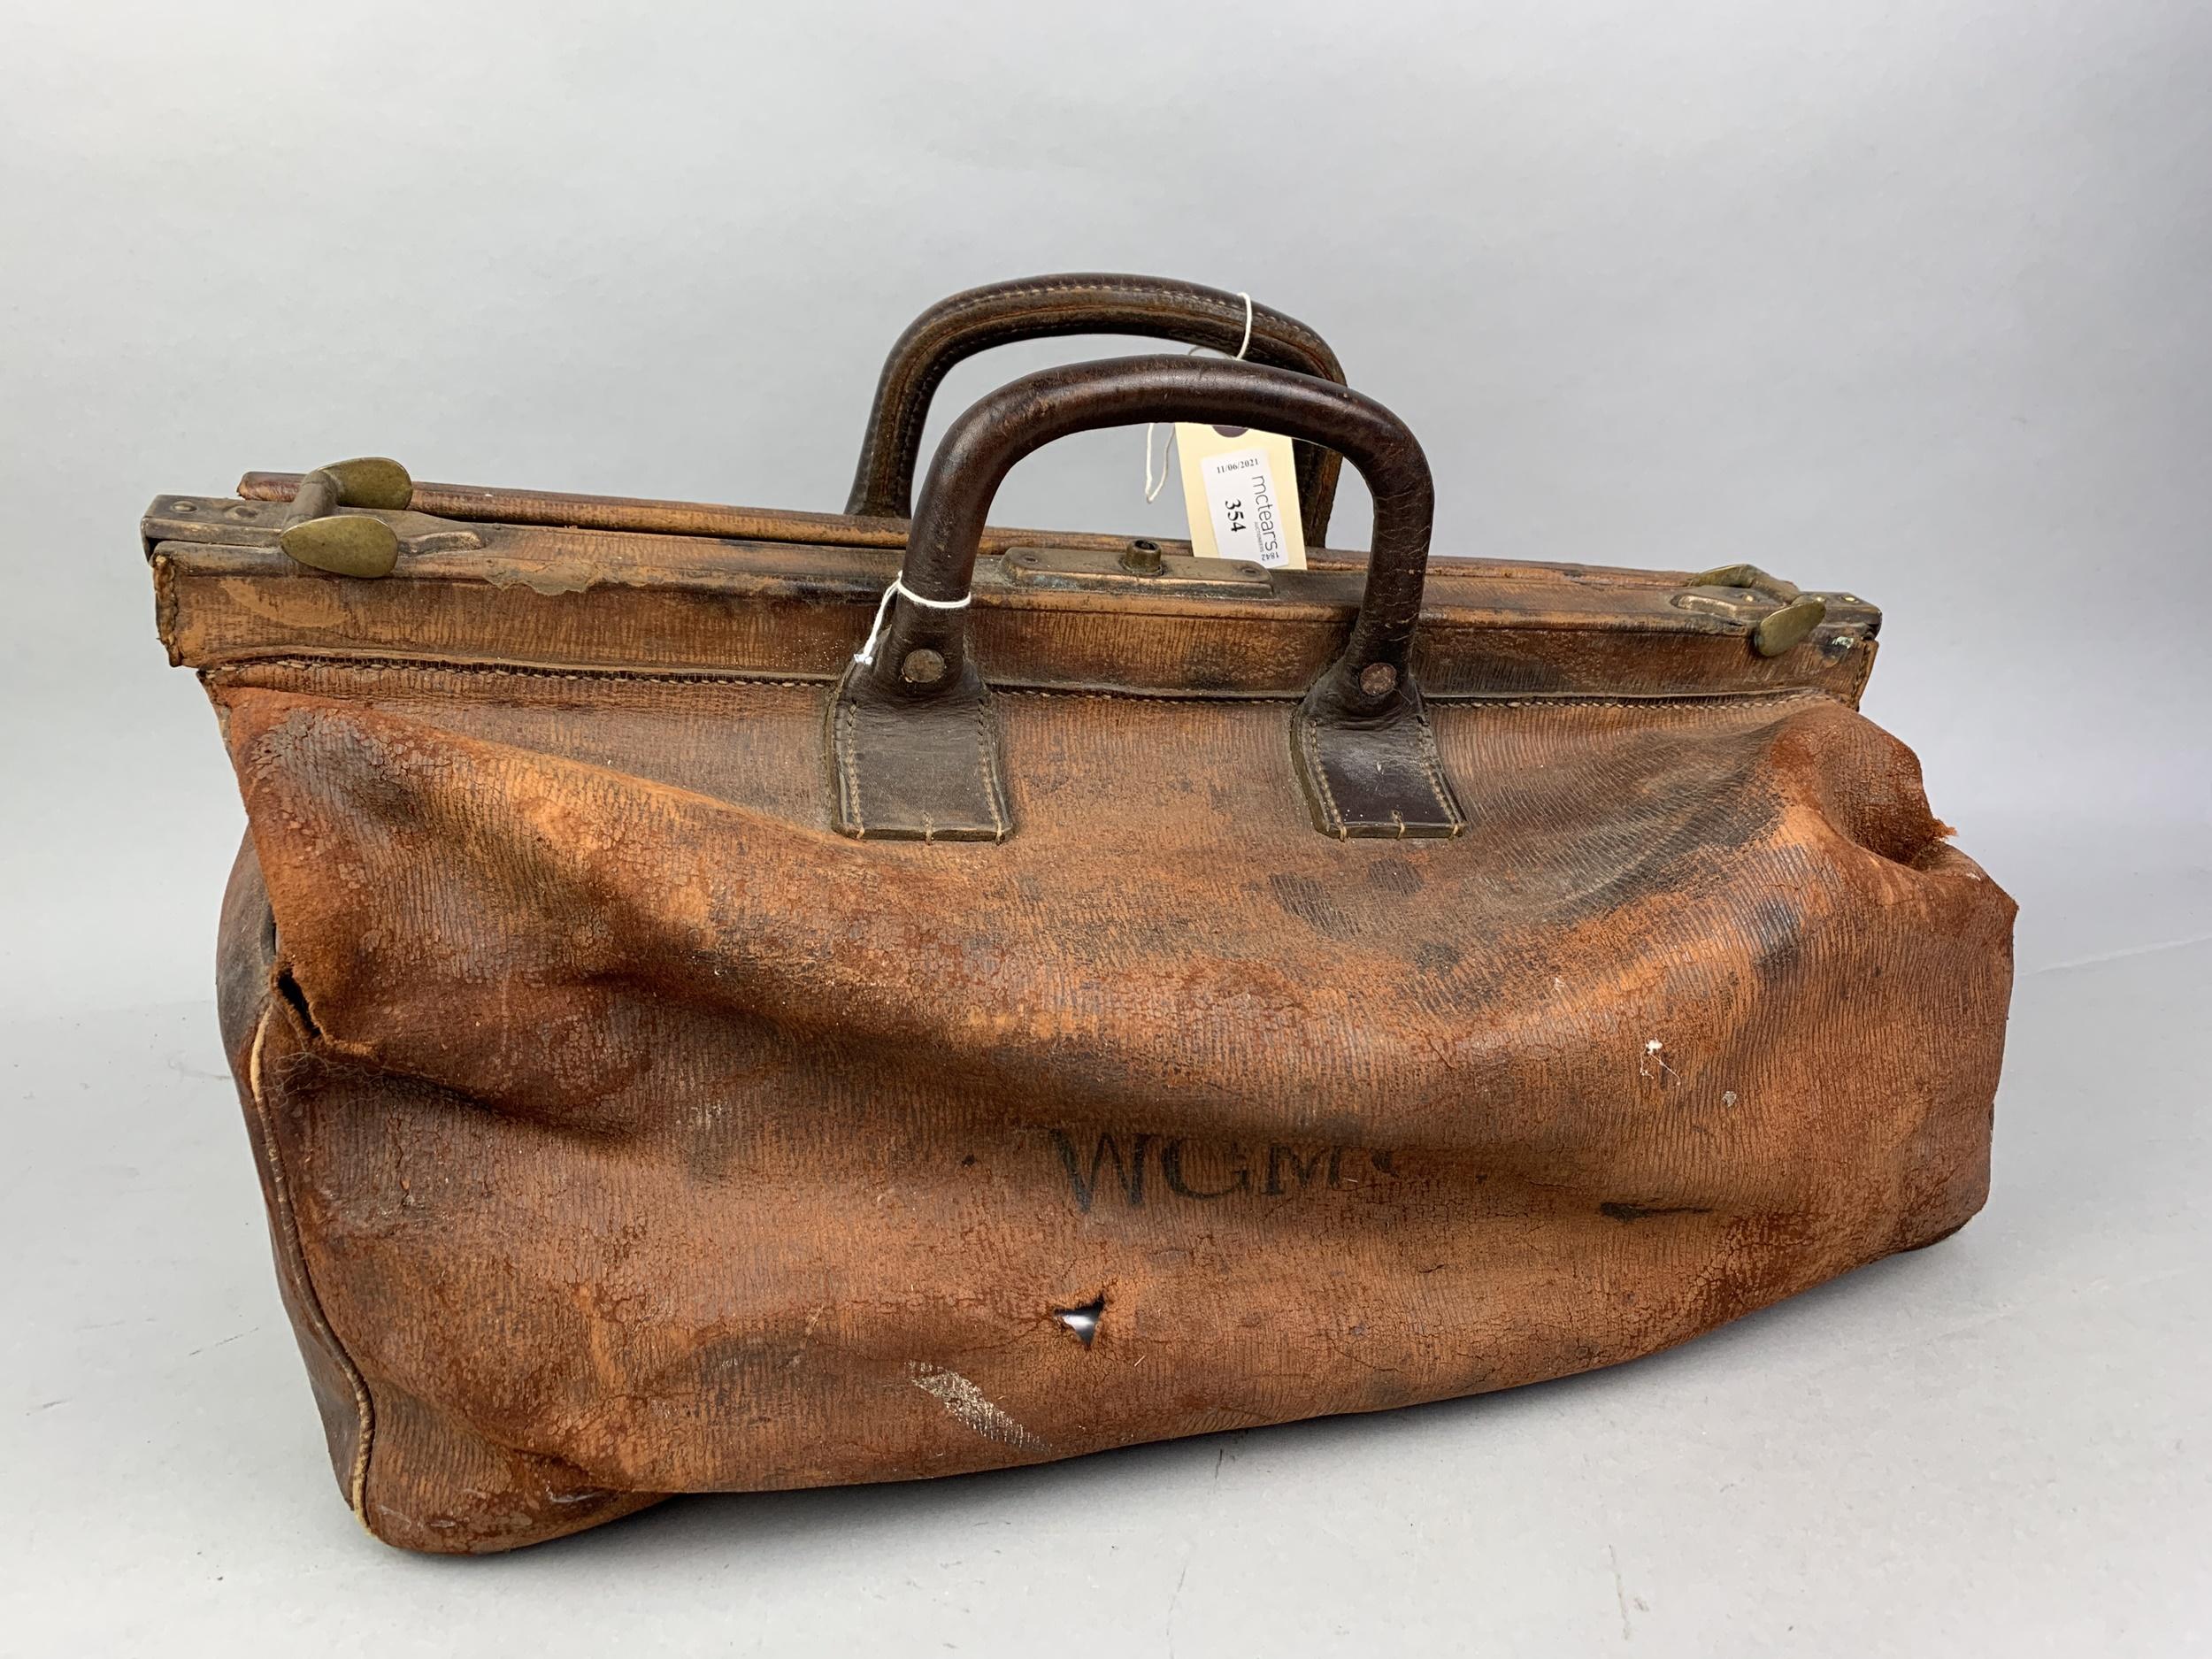 A LEATHER GLADSTONE BAG